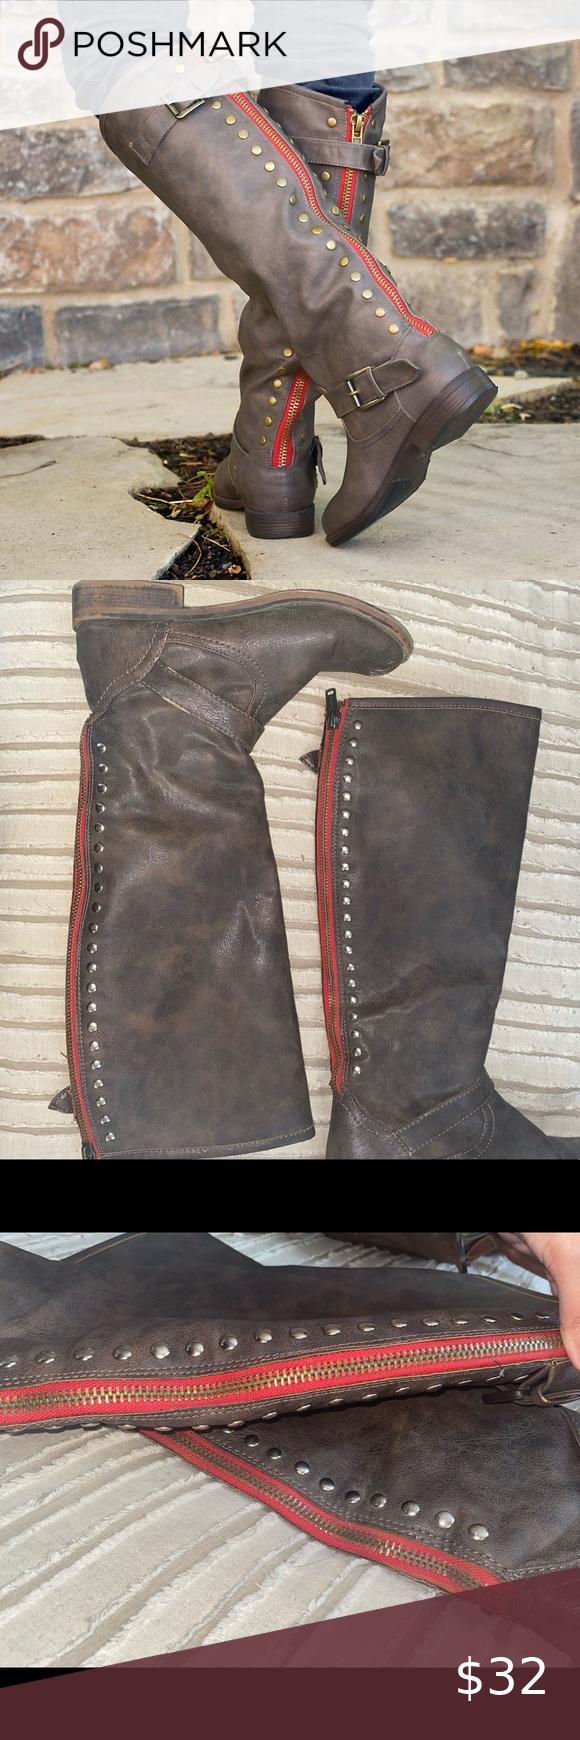 Kohl's Journee Spokane Knee High Boots